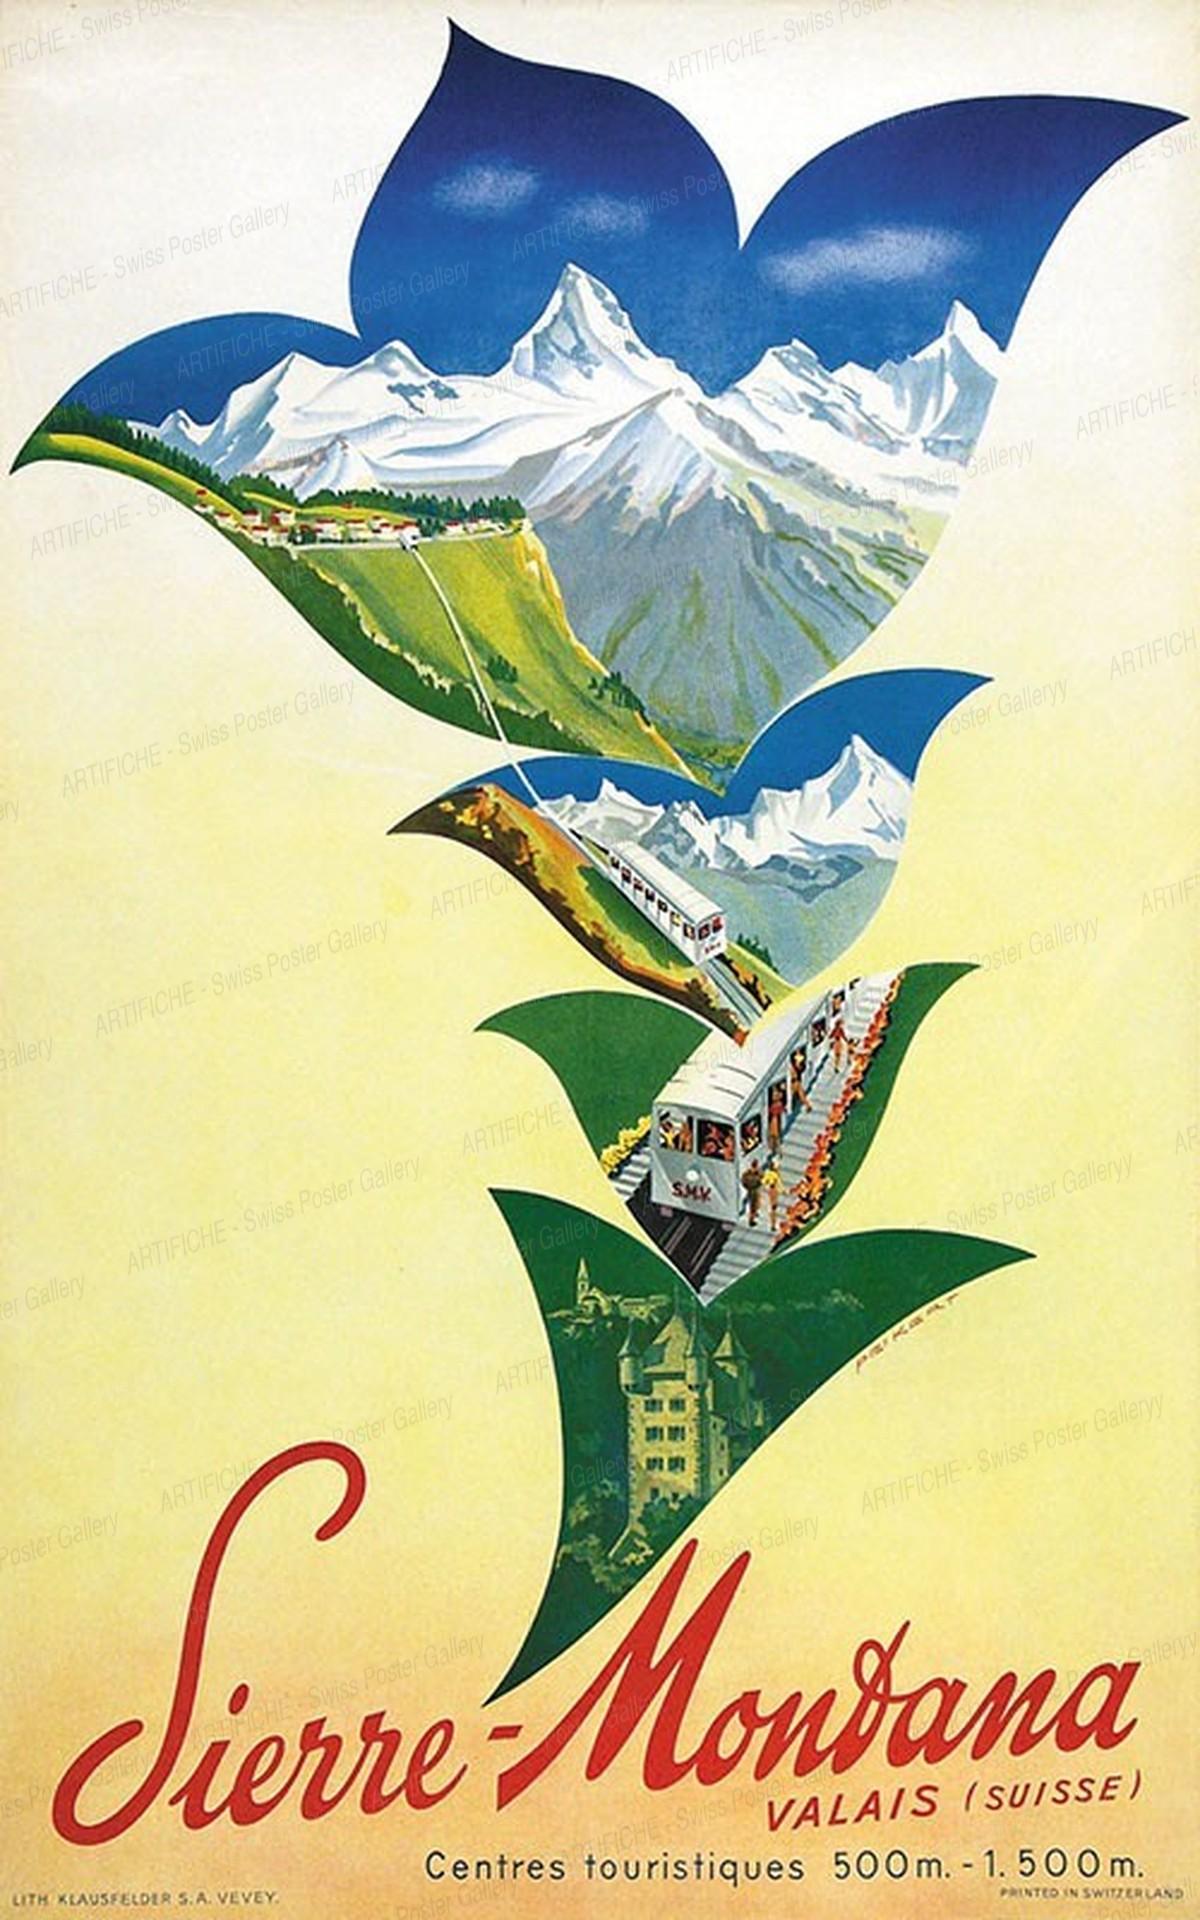 Sierre-Montana Valais (Suisse), Martin Peikert